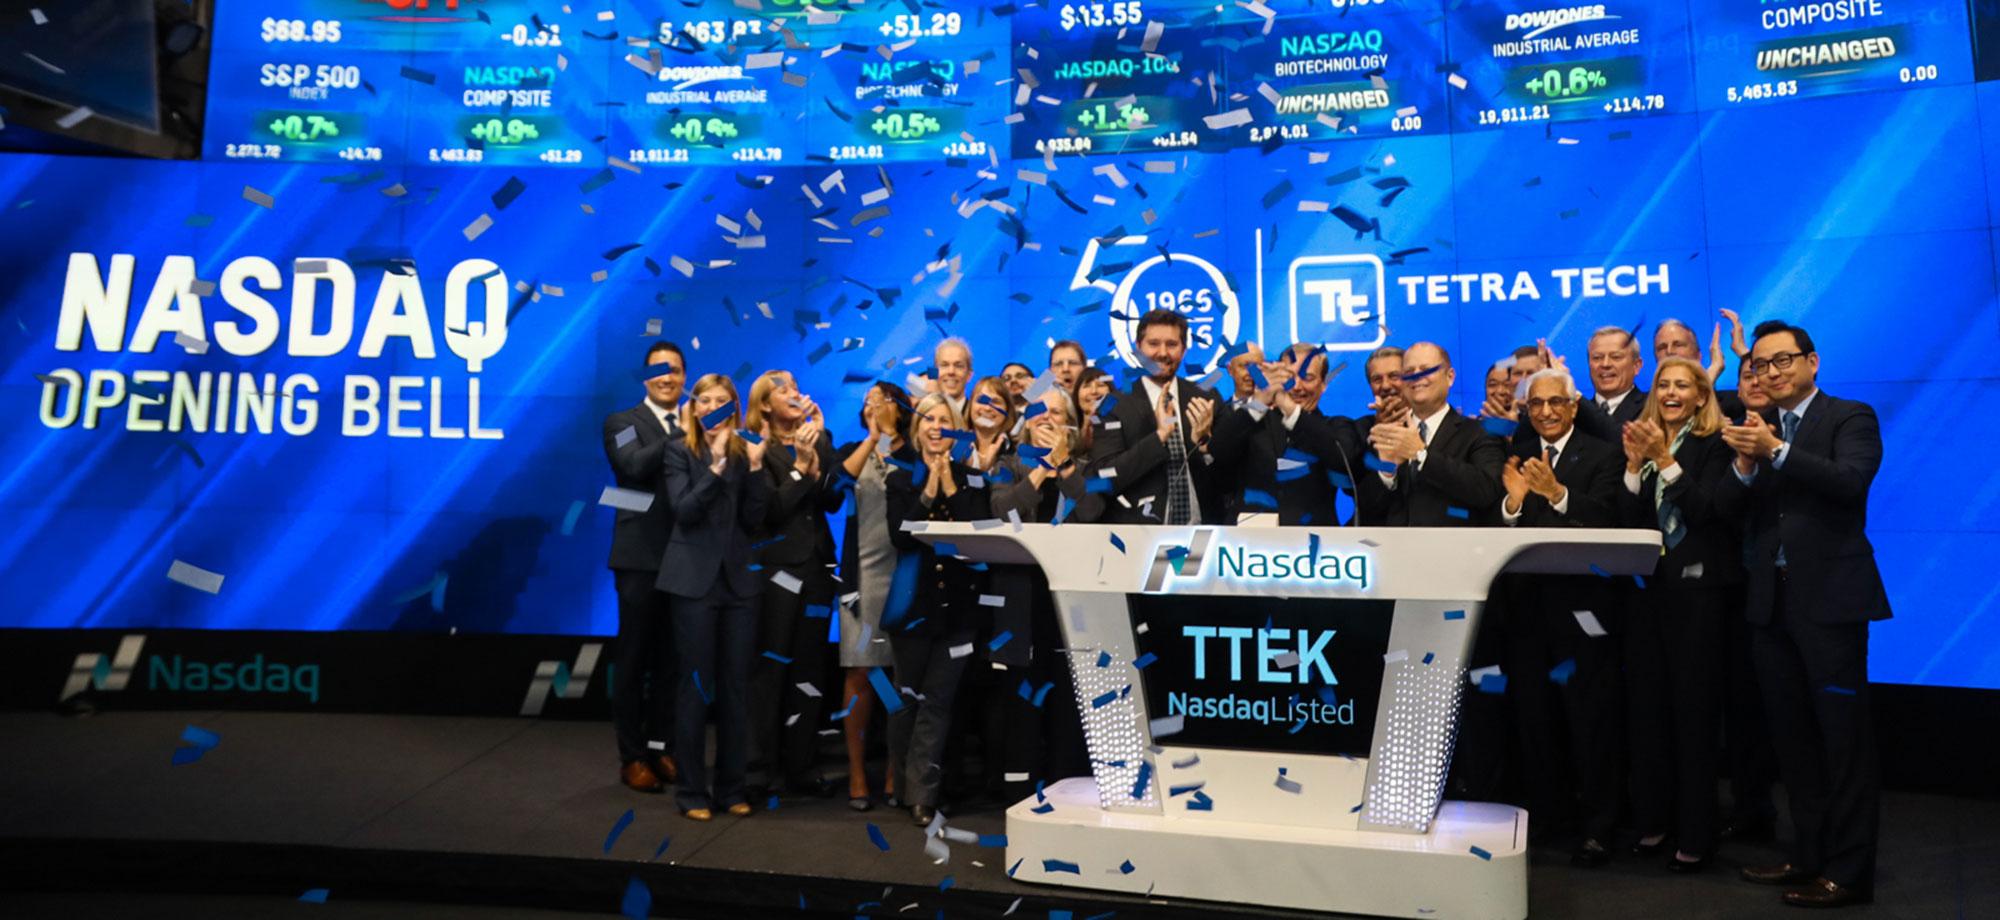 Tetra Tech rang the NASDAQ opening bell on December 14. Read more.